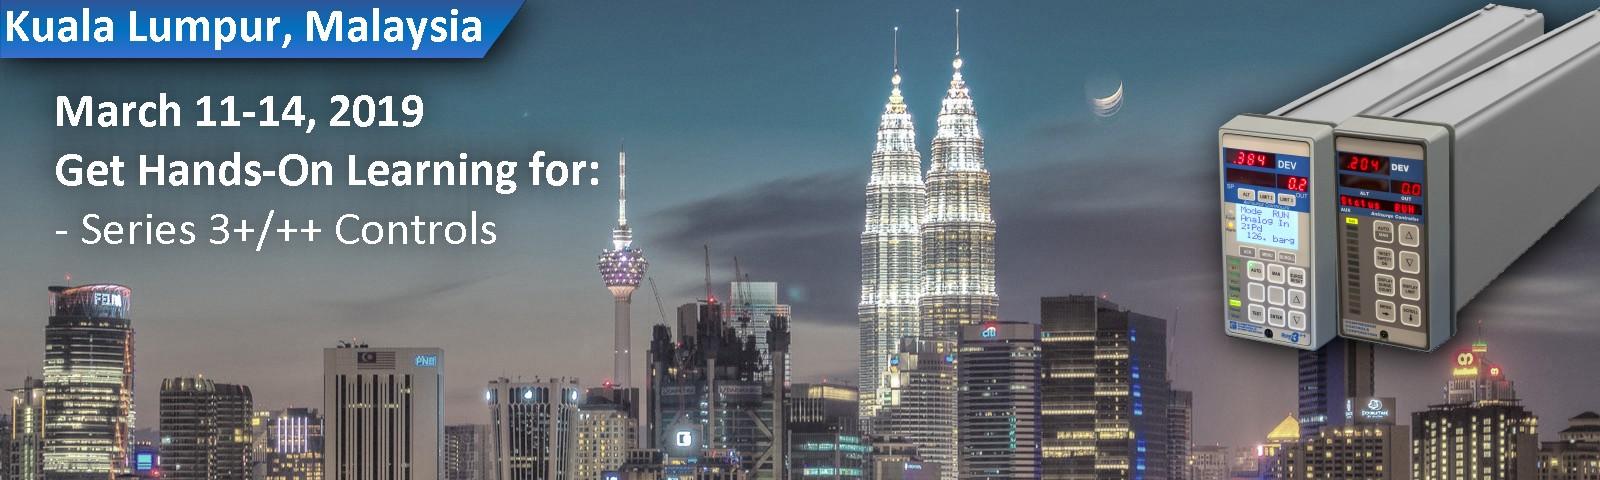 2019 Kuala Lumpur S3+/++ Regional Training | <a  data-cke-saved-href='https://learning.cccglobal.com/ProductDetails.aspx?ProductID=281' href='https://learning.cccglobal.com/ProductDetails.aspx?ProductID=281'>Register Now</a>